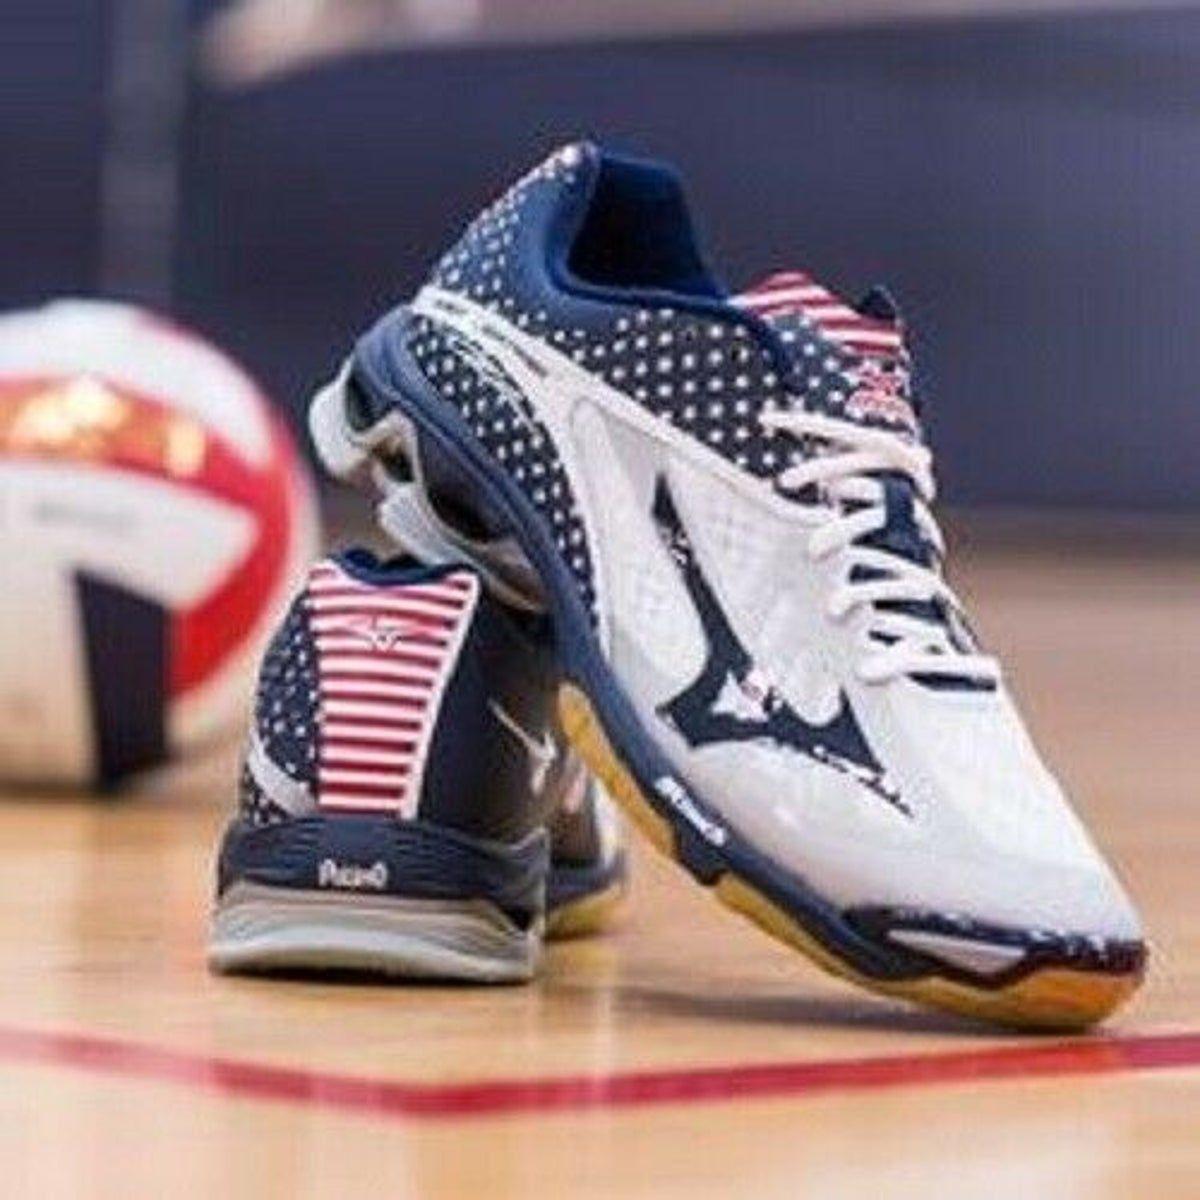 Mizuno Wave Lighting Z2 Volleyball 11 5 In 2020 Volleyball Shoes Volleyball Sneakers Mizuno Volleyball